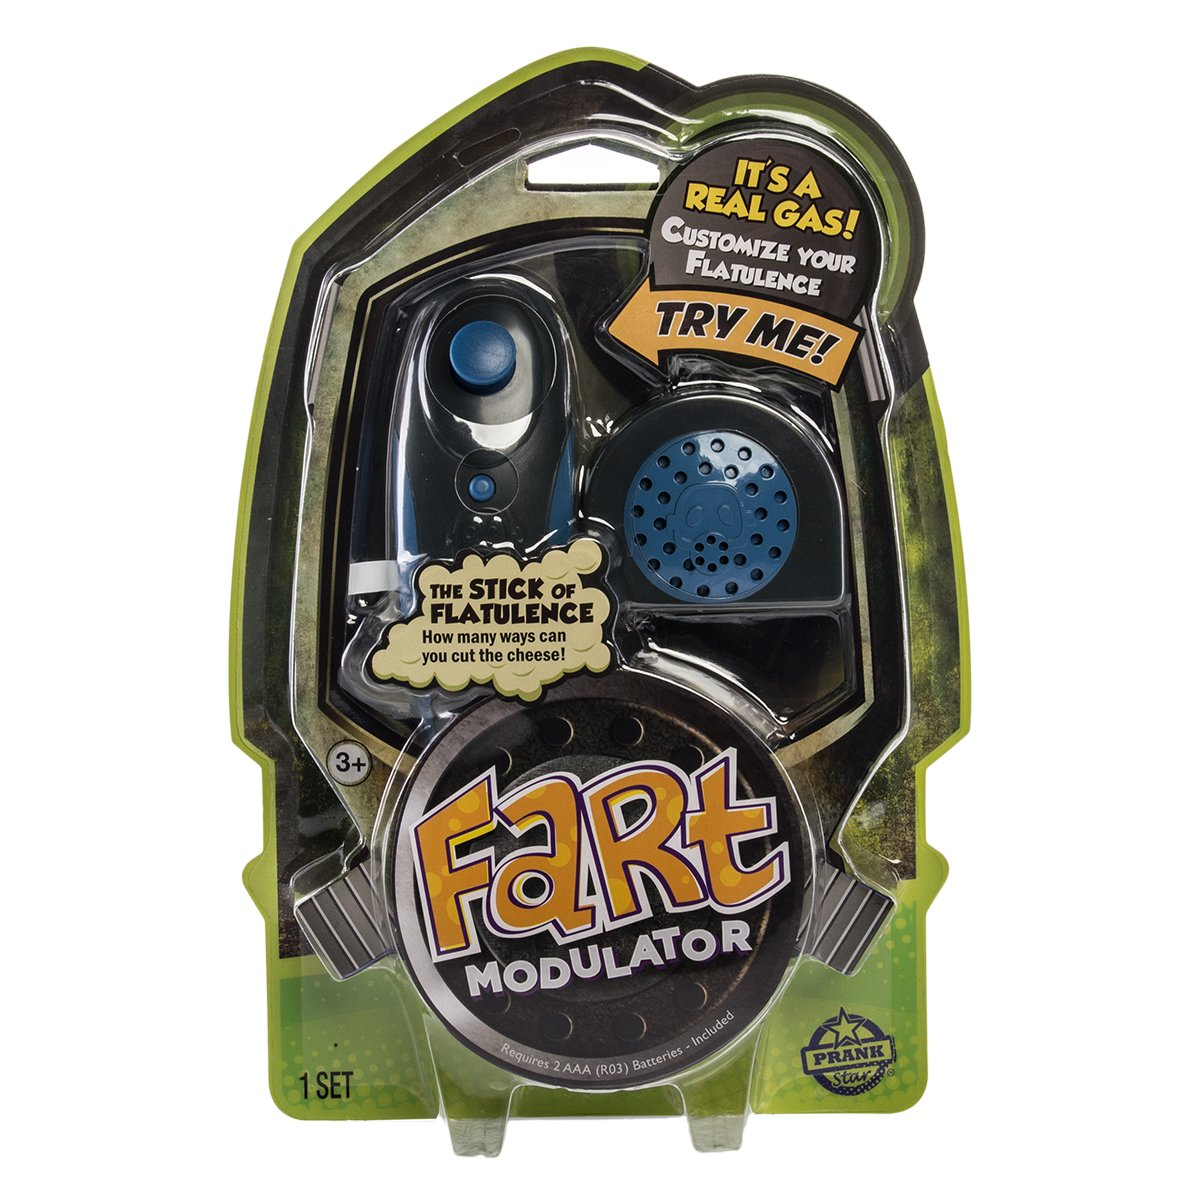 Amazon.com: Prank Star Fart modulador, 1 Set: Toys & Games